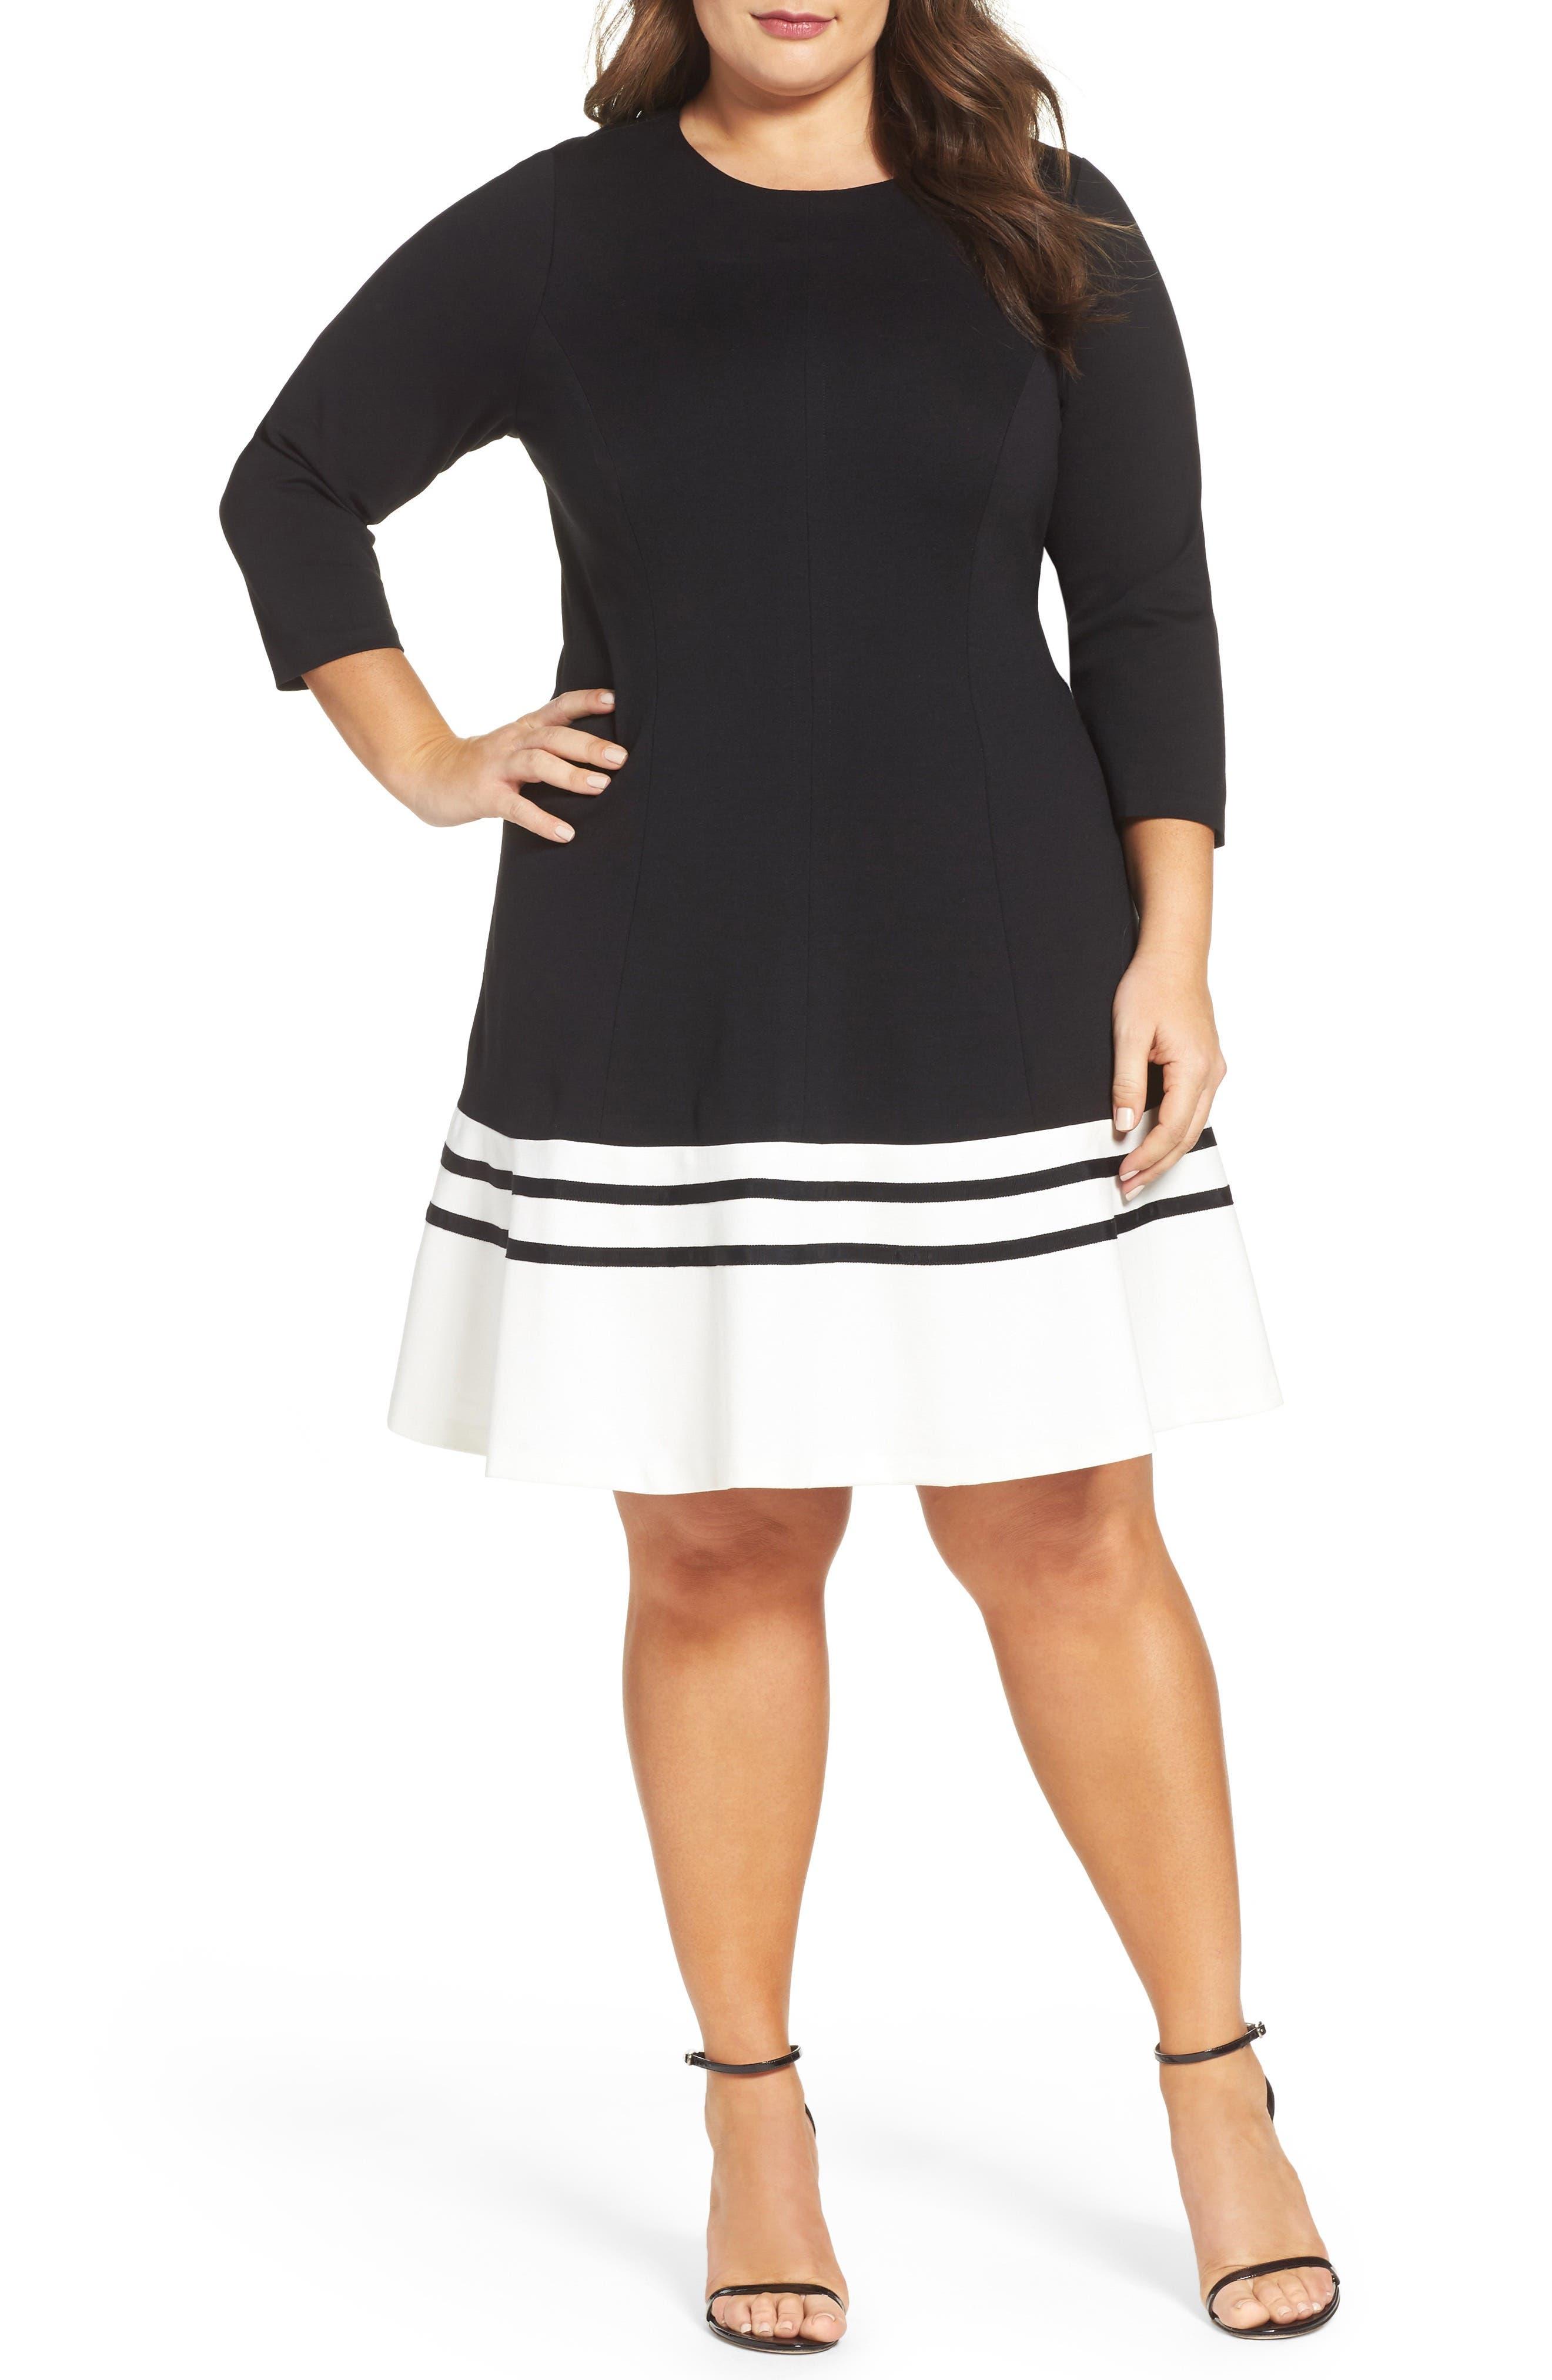 Alternate Image 1 Selected - Eliza J Ponte Fit & Flare Dress (Plus Size)